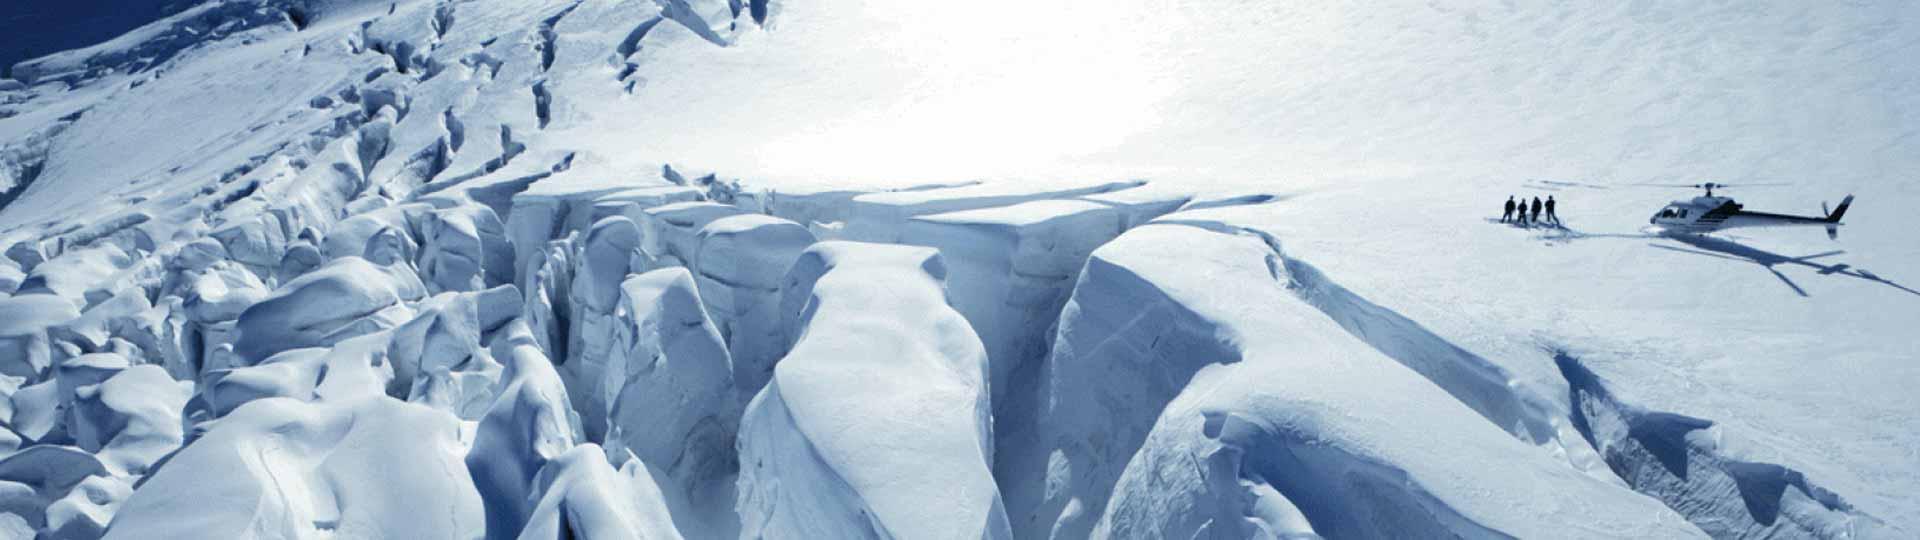 snowy-mountain-queenstown